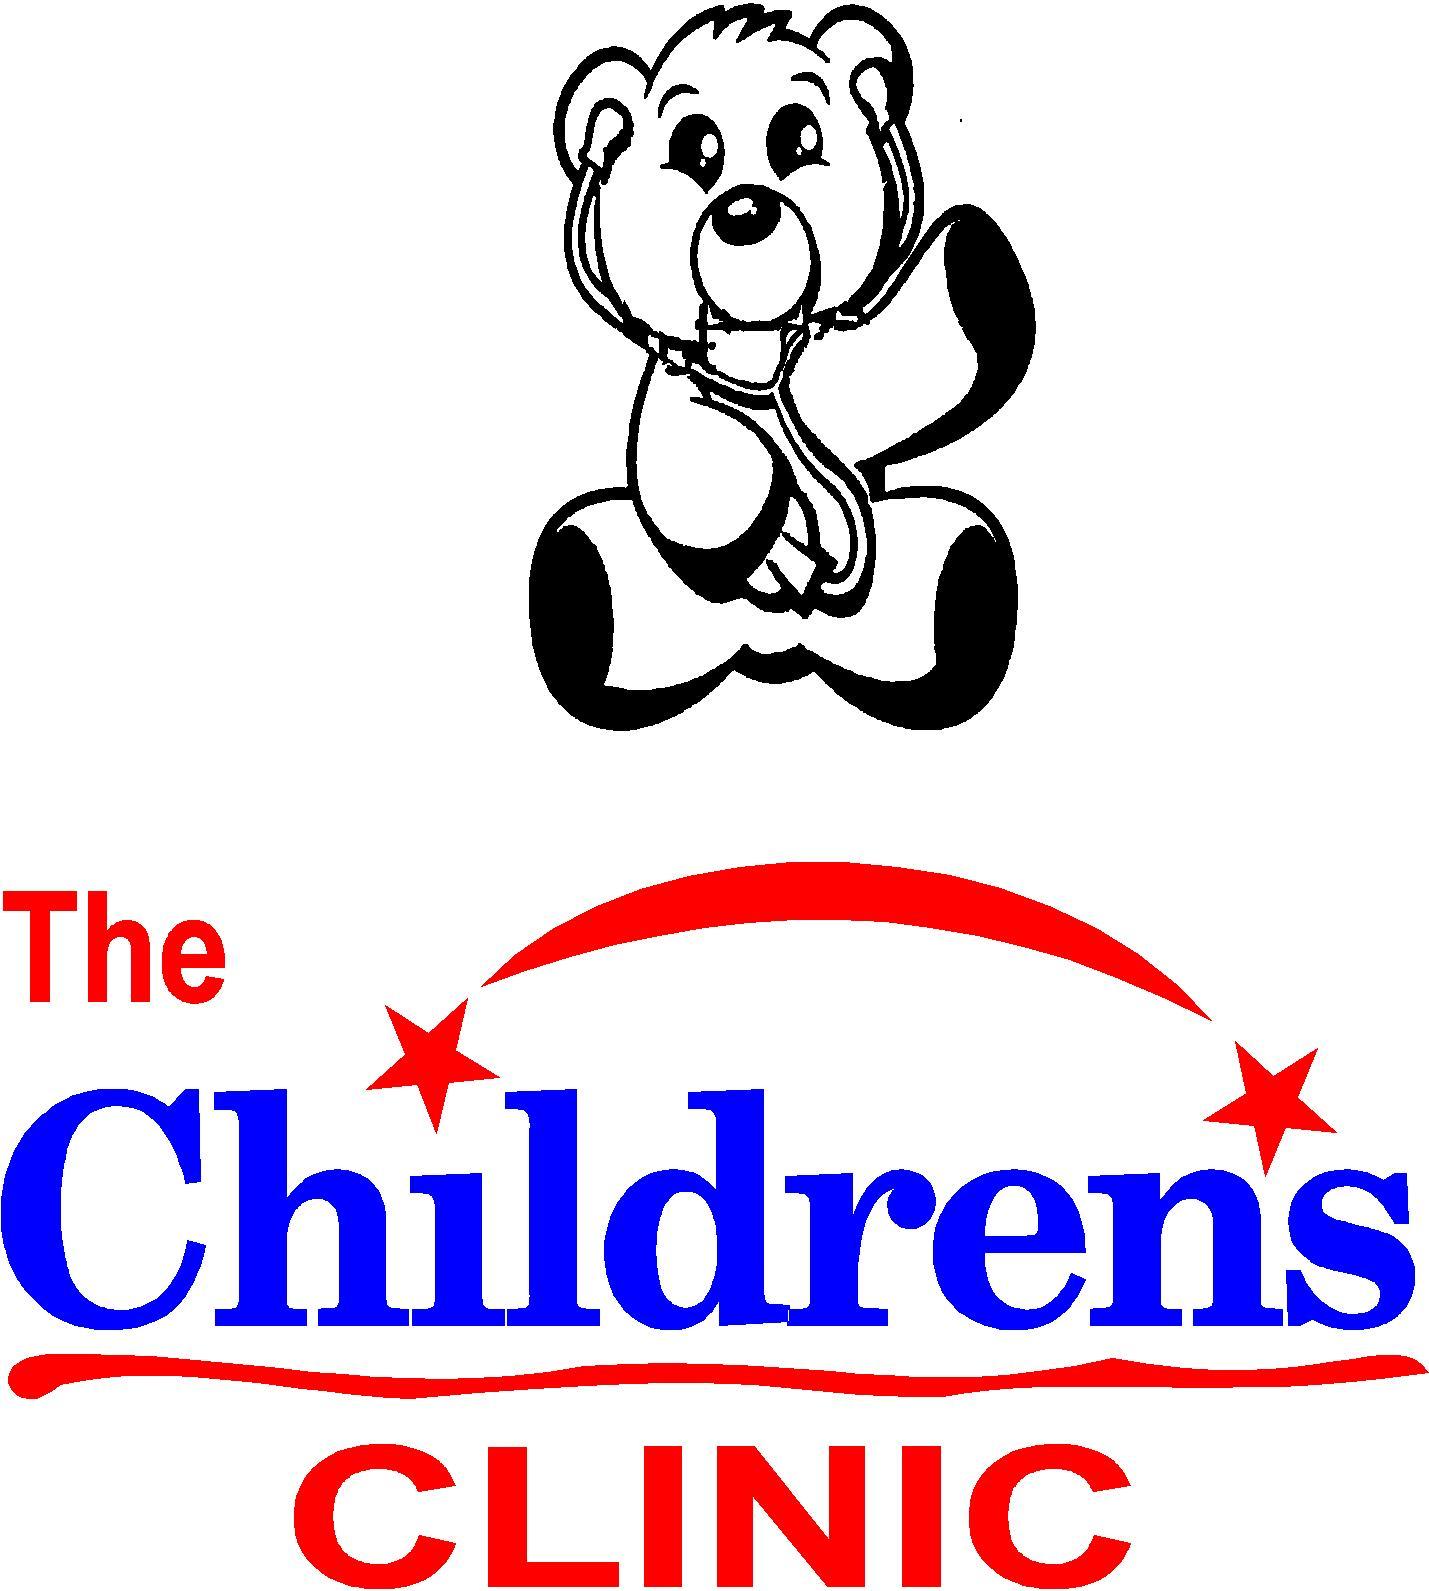 Dr. Dutta Child Clinic